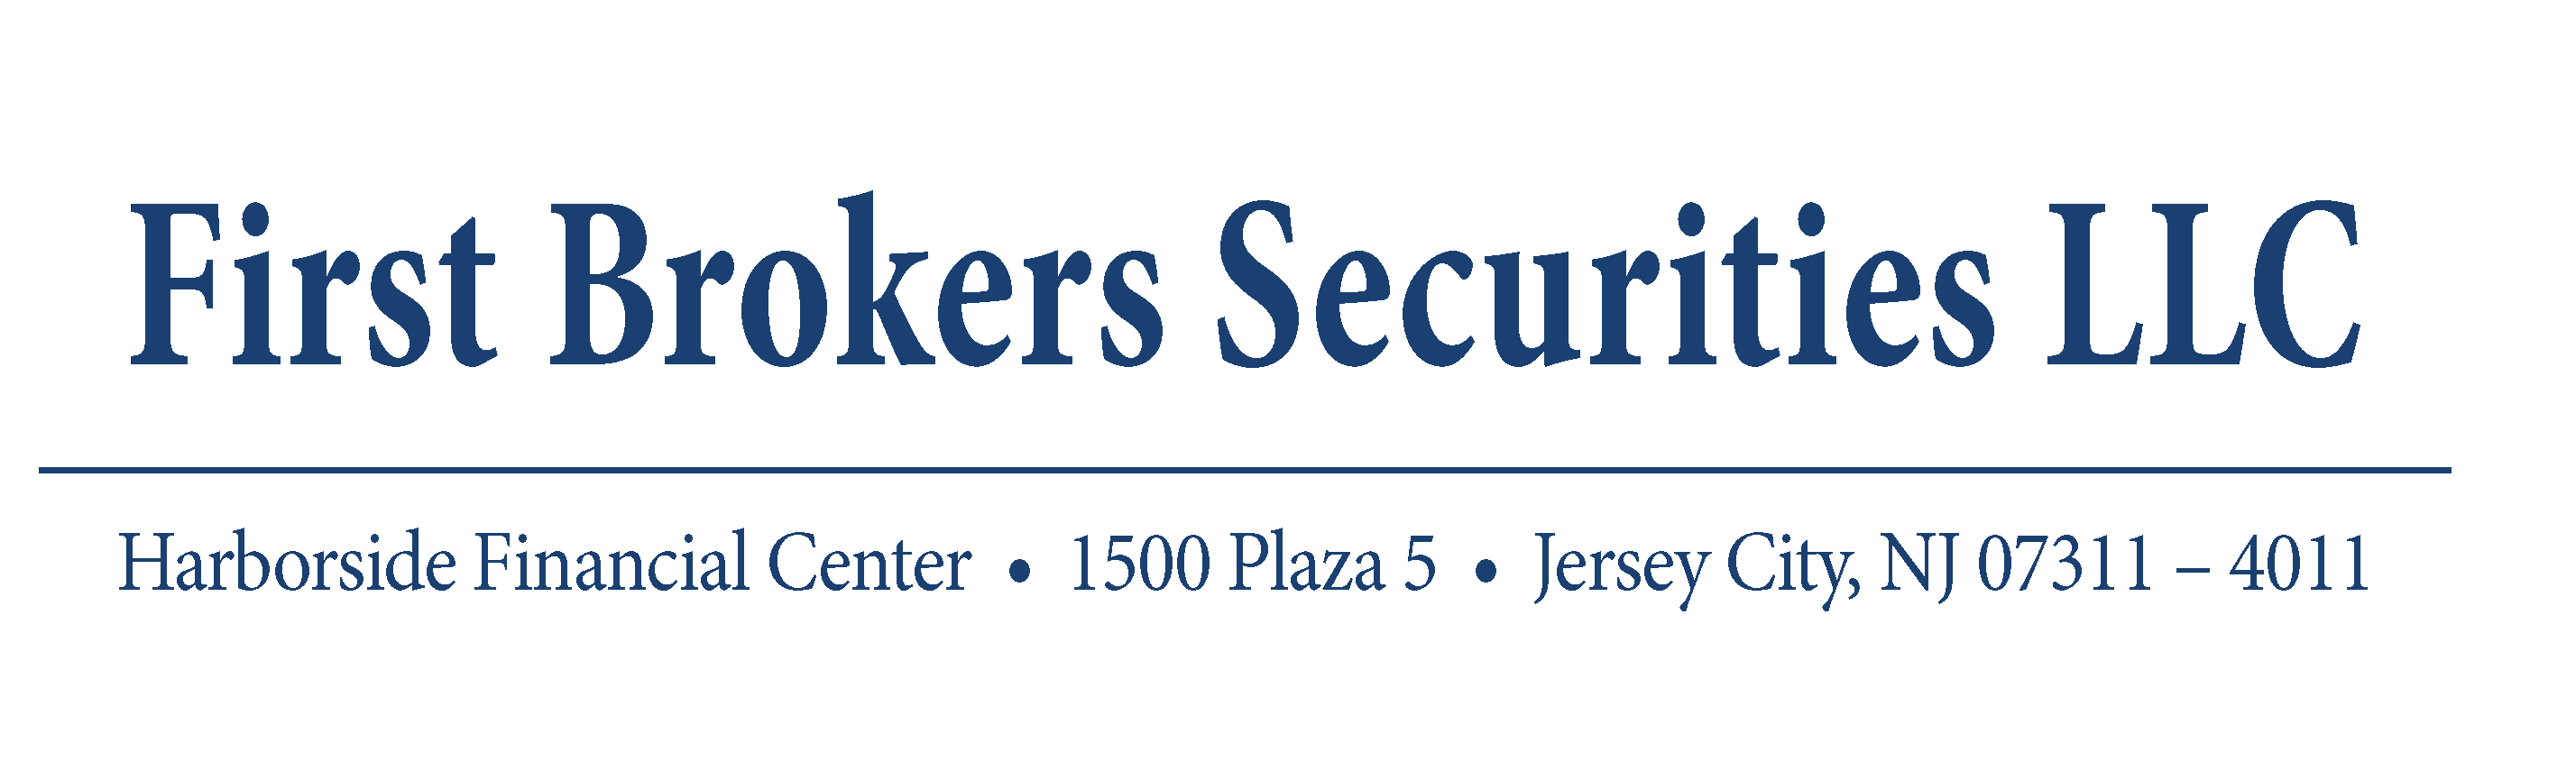 First Brokers Securities.png